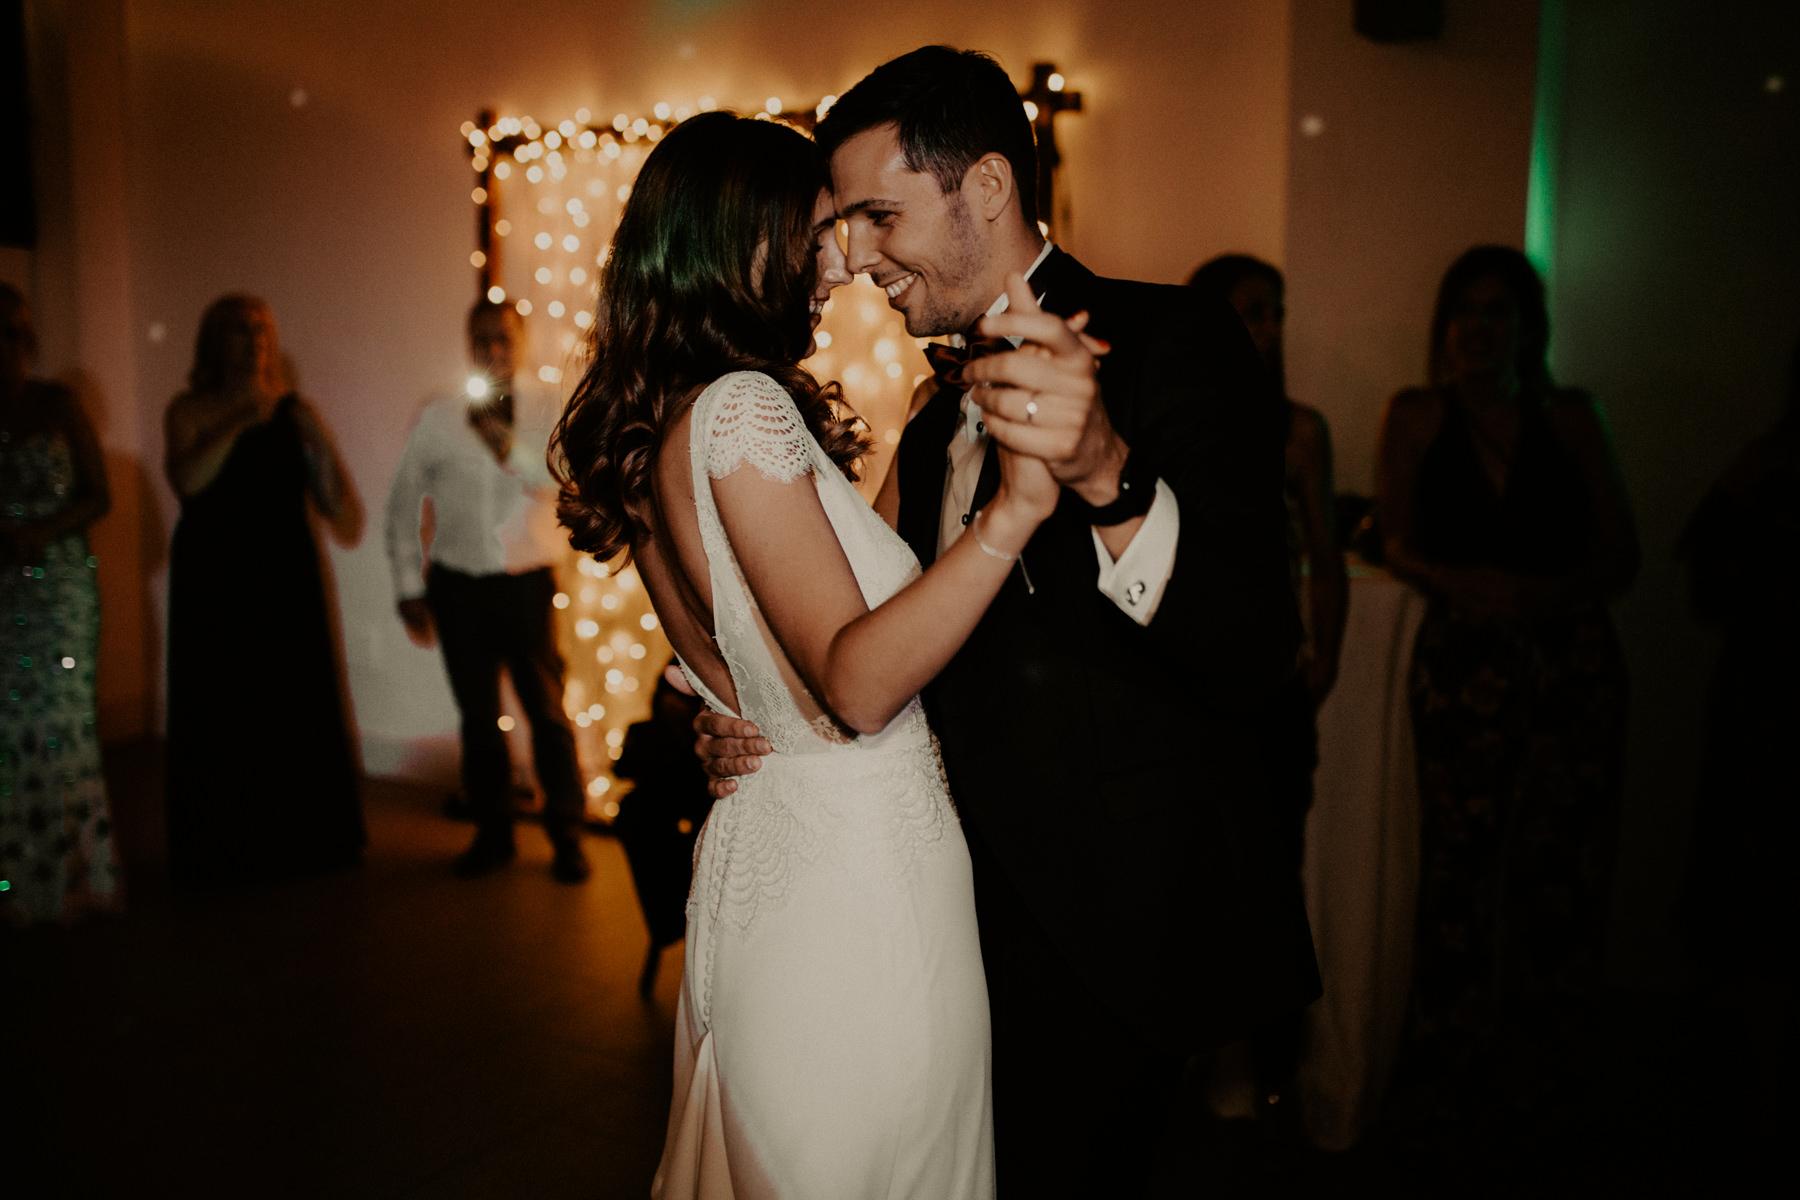 alt_thenortherngirlphotography_couples_weddingphotographer_photographer_wedding_boda_fotografodebodas_fotografobodasbarcelona_bodaindie_bodasconestilo_bodaensantperedeclara_jennifermiguel-967.jpg